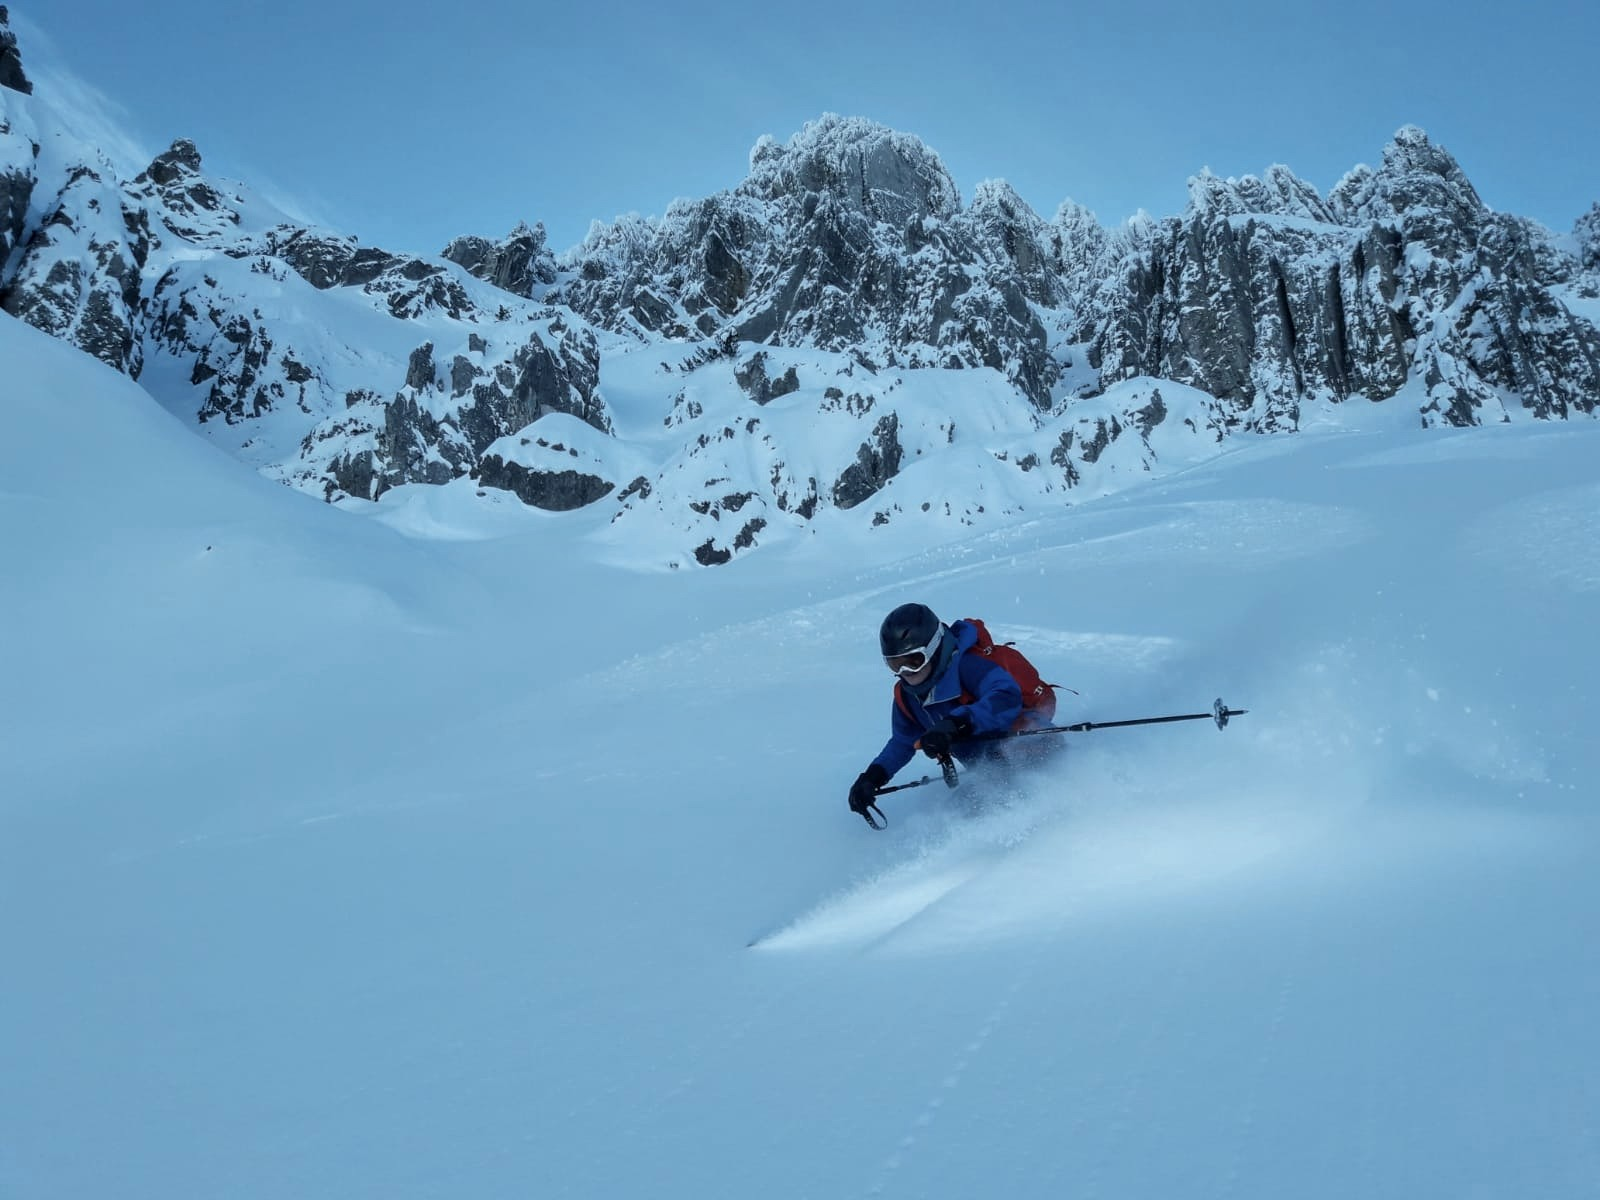 Susi Süßmeier, Frauenpower im Schnee, Foto: Susi Süßmeier |Climbers Paradise